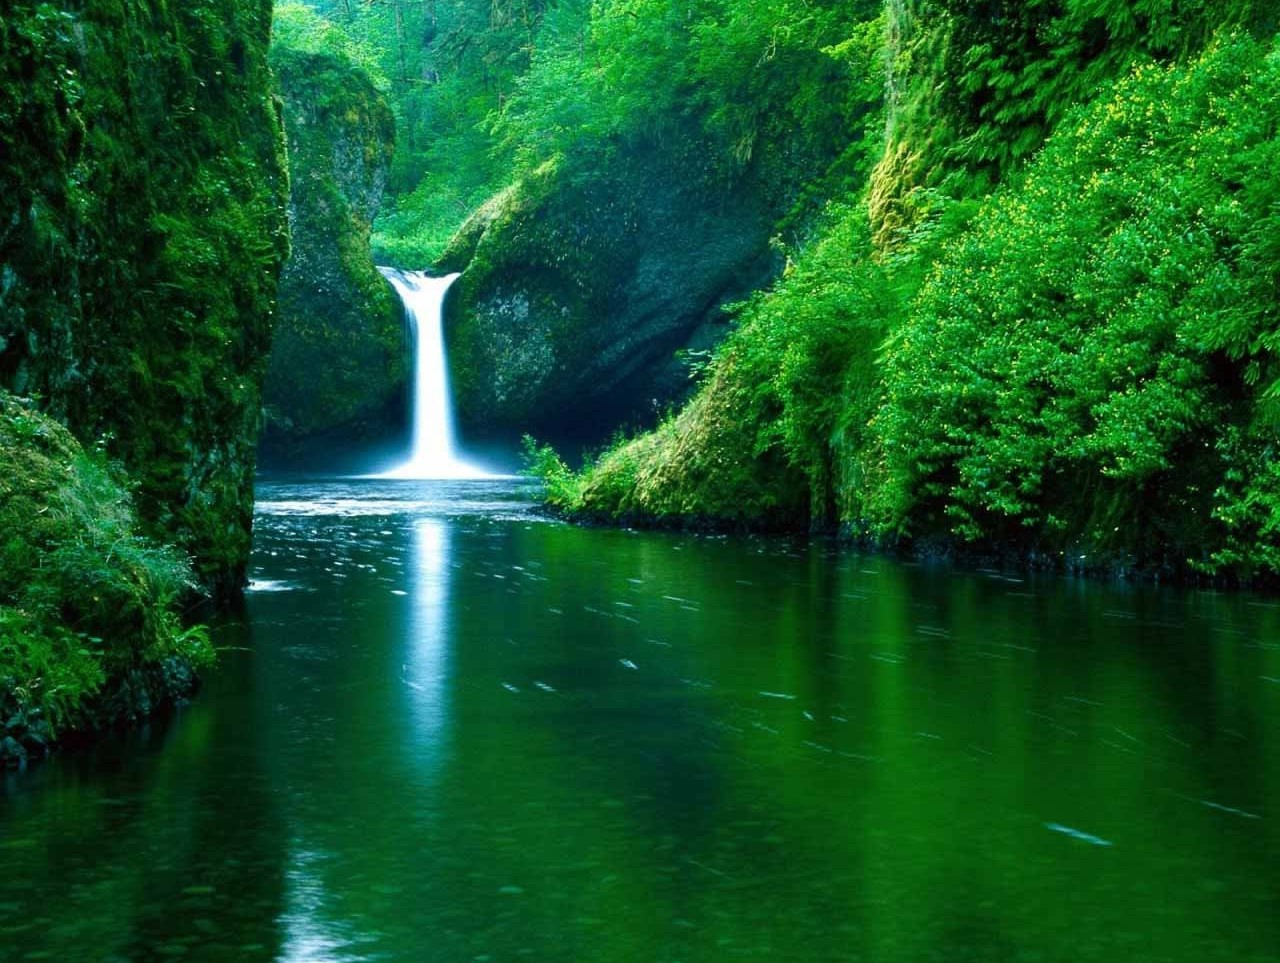 Fotos bonitas paisajes